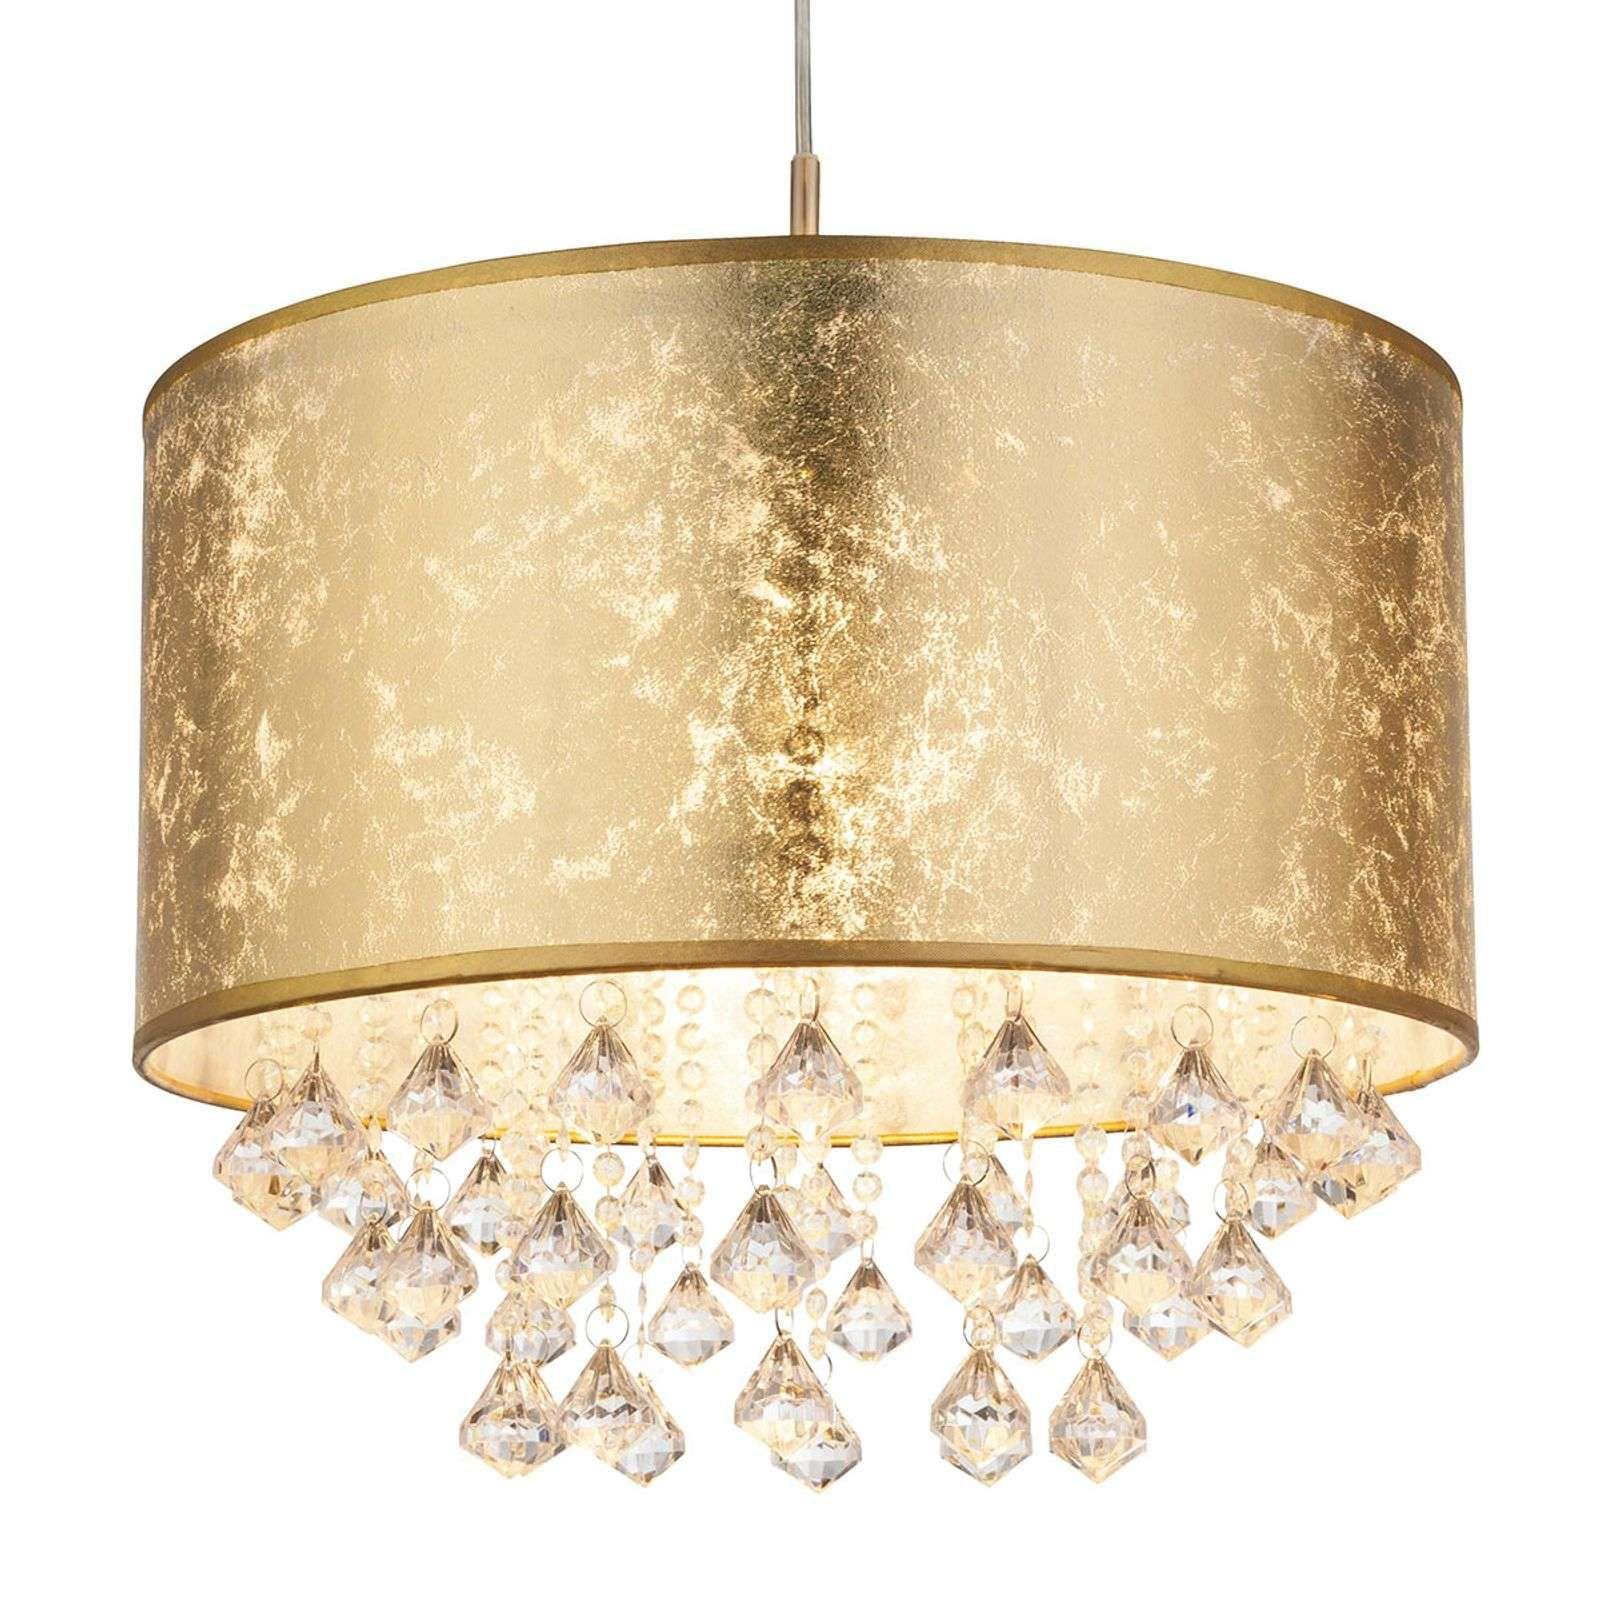 Epingle Par Adriana Spironello Sur Casa En 2020 Lampe Suspendue Luminaire Led Suspension Doree